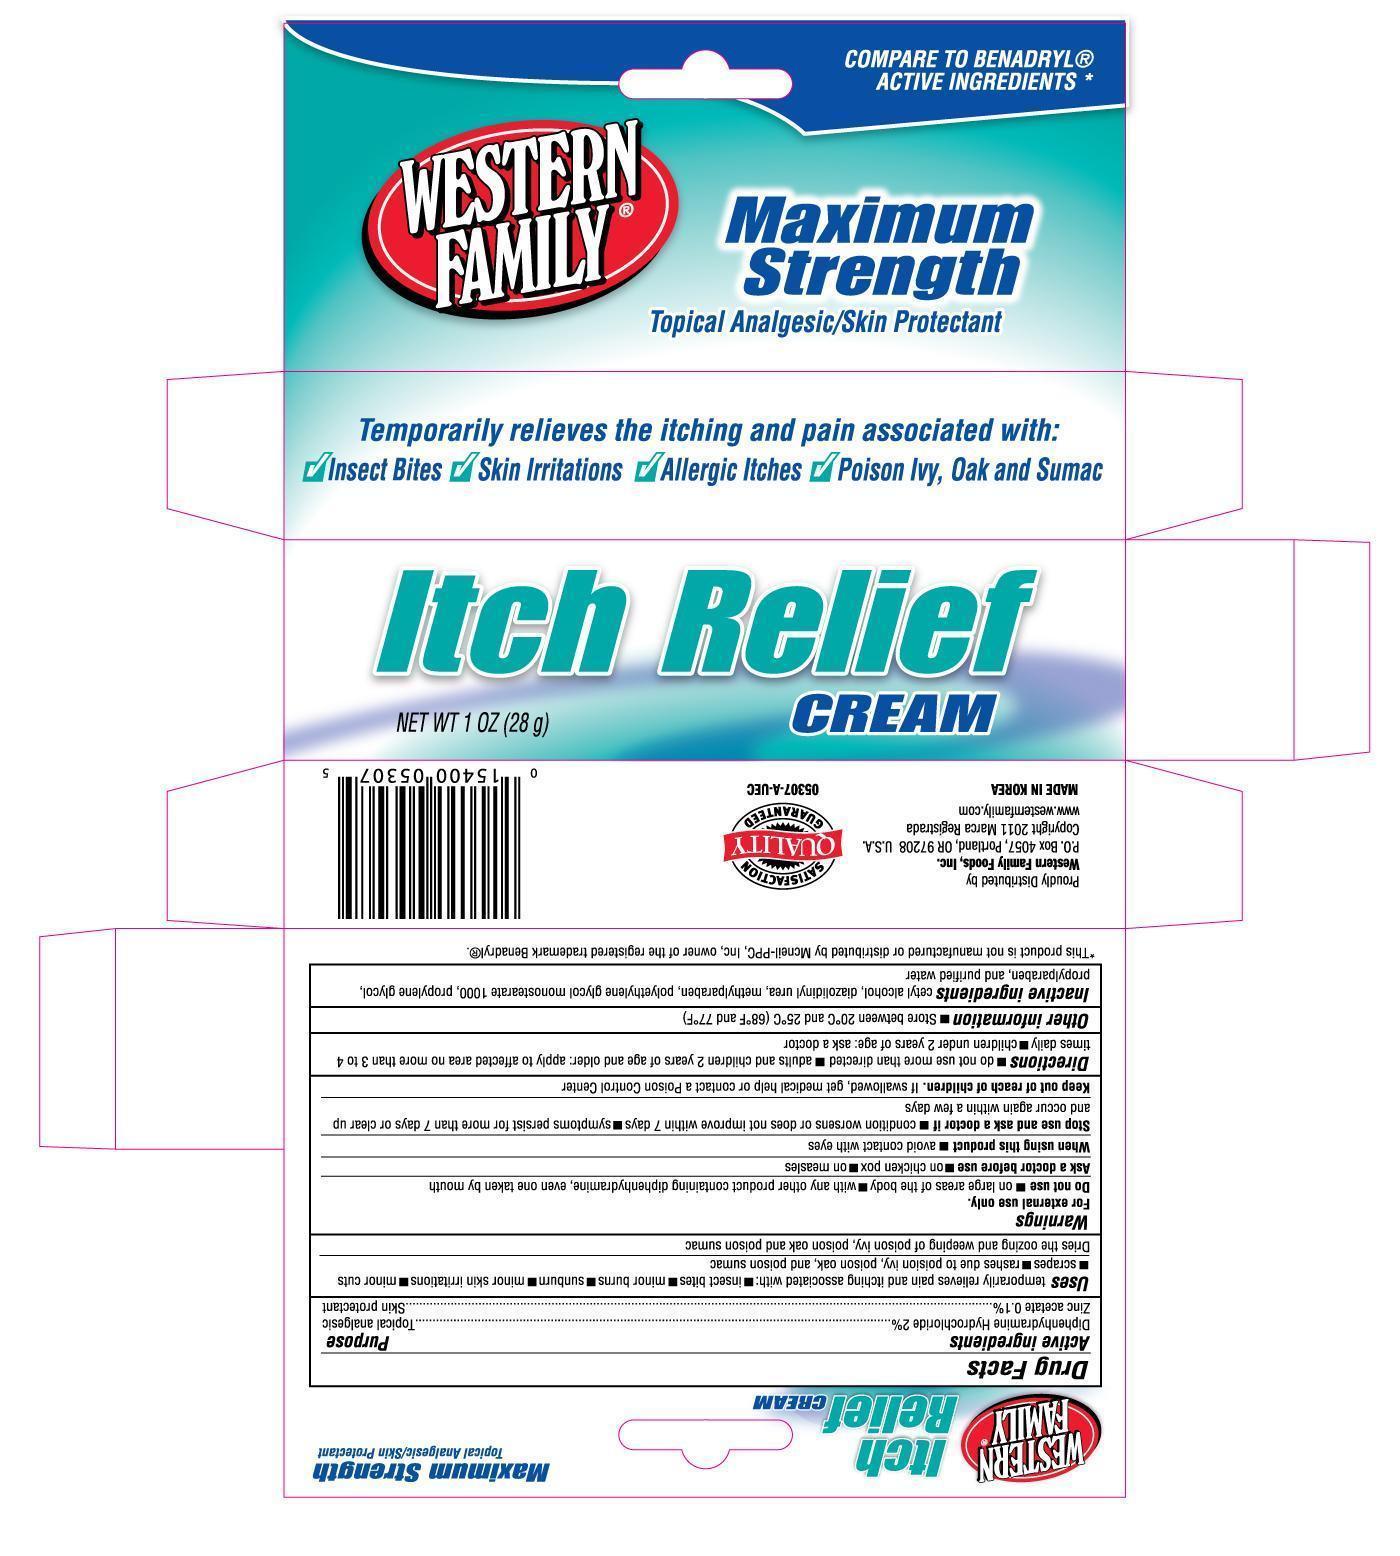 Western Family Itch Relief (Diphenhydramine Hydrochloride, Zinc Acetate) Cream [Western Family Food, Inc.]